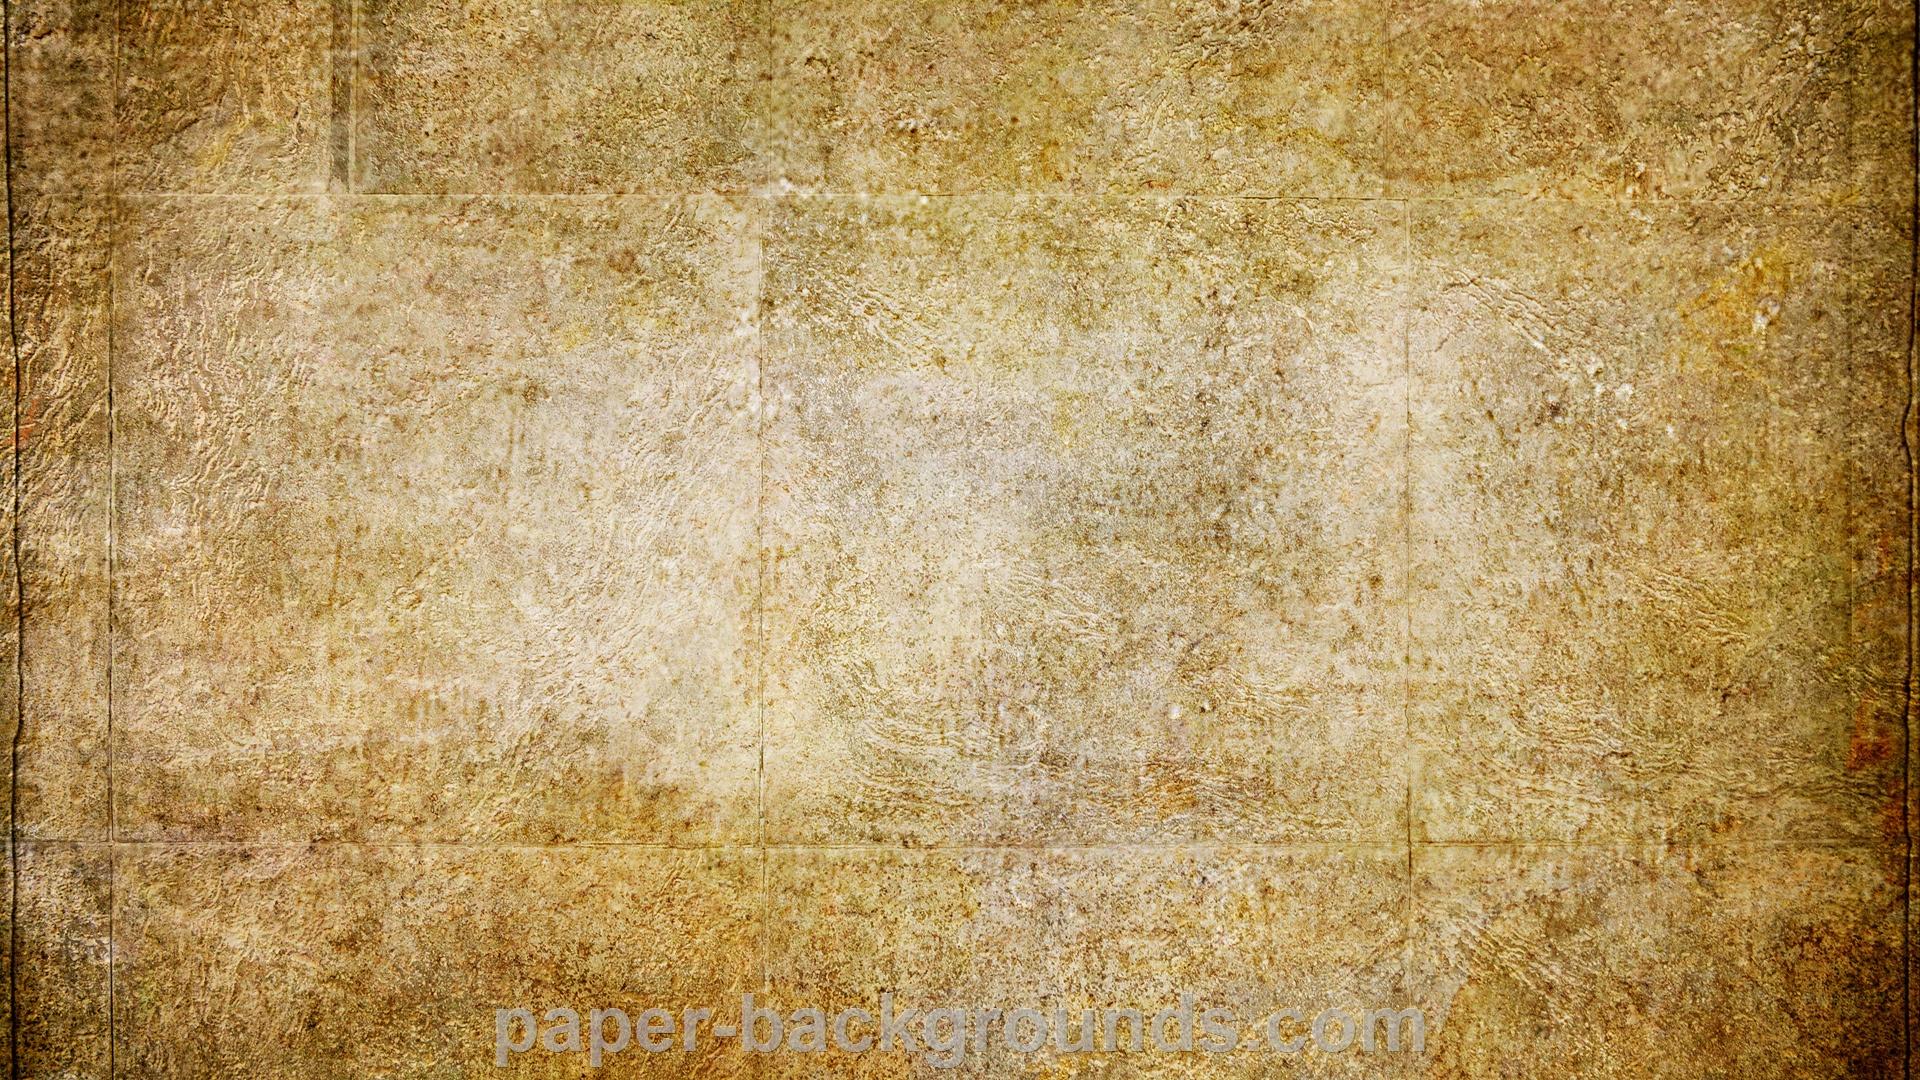 Grunge Wall Texture Paper Wallpaper 1920x1080 Full HD Wallpapers 1920x1080